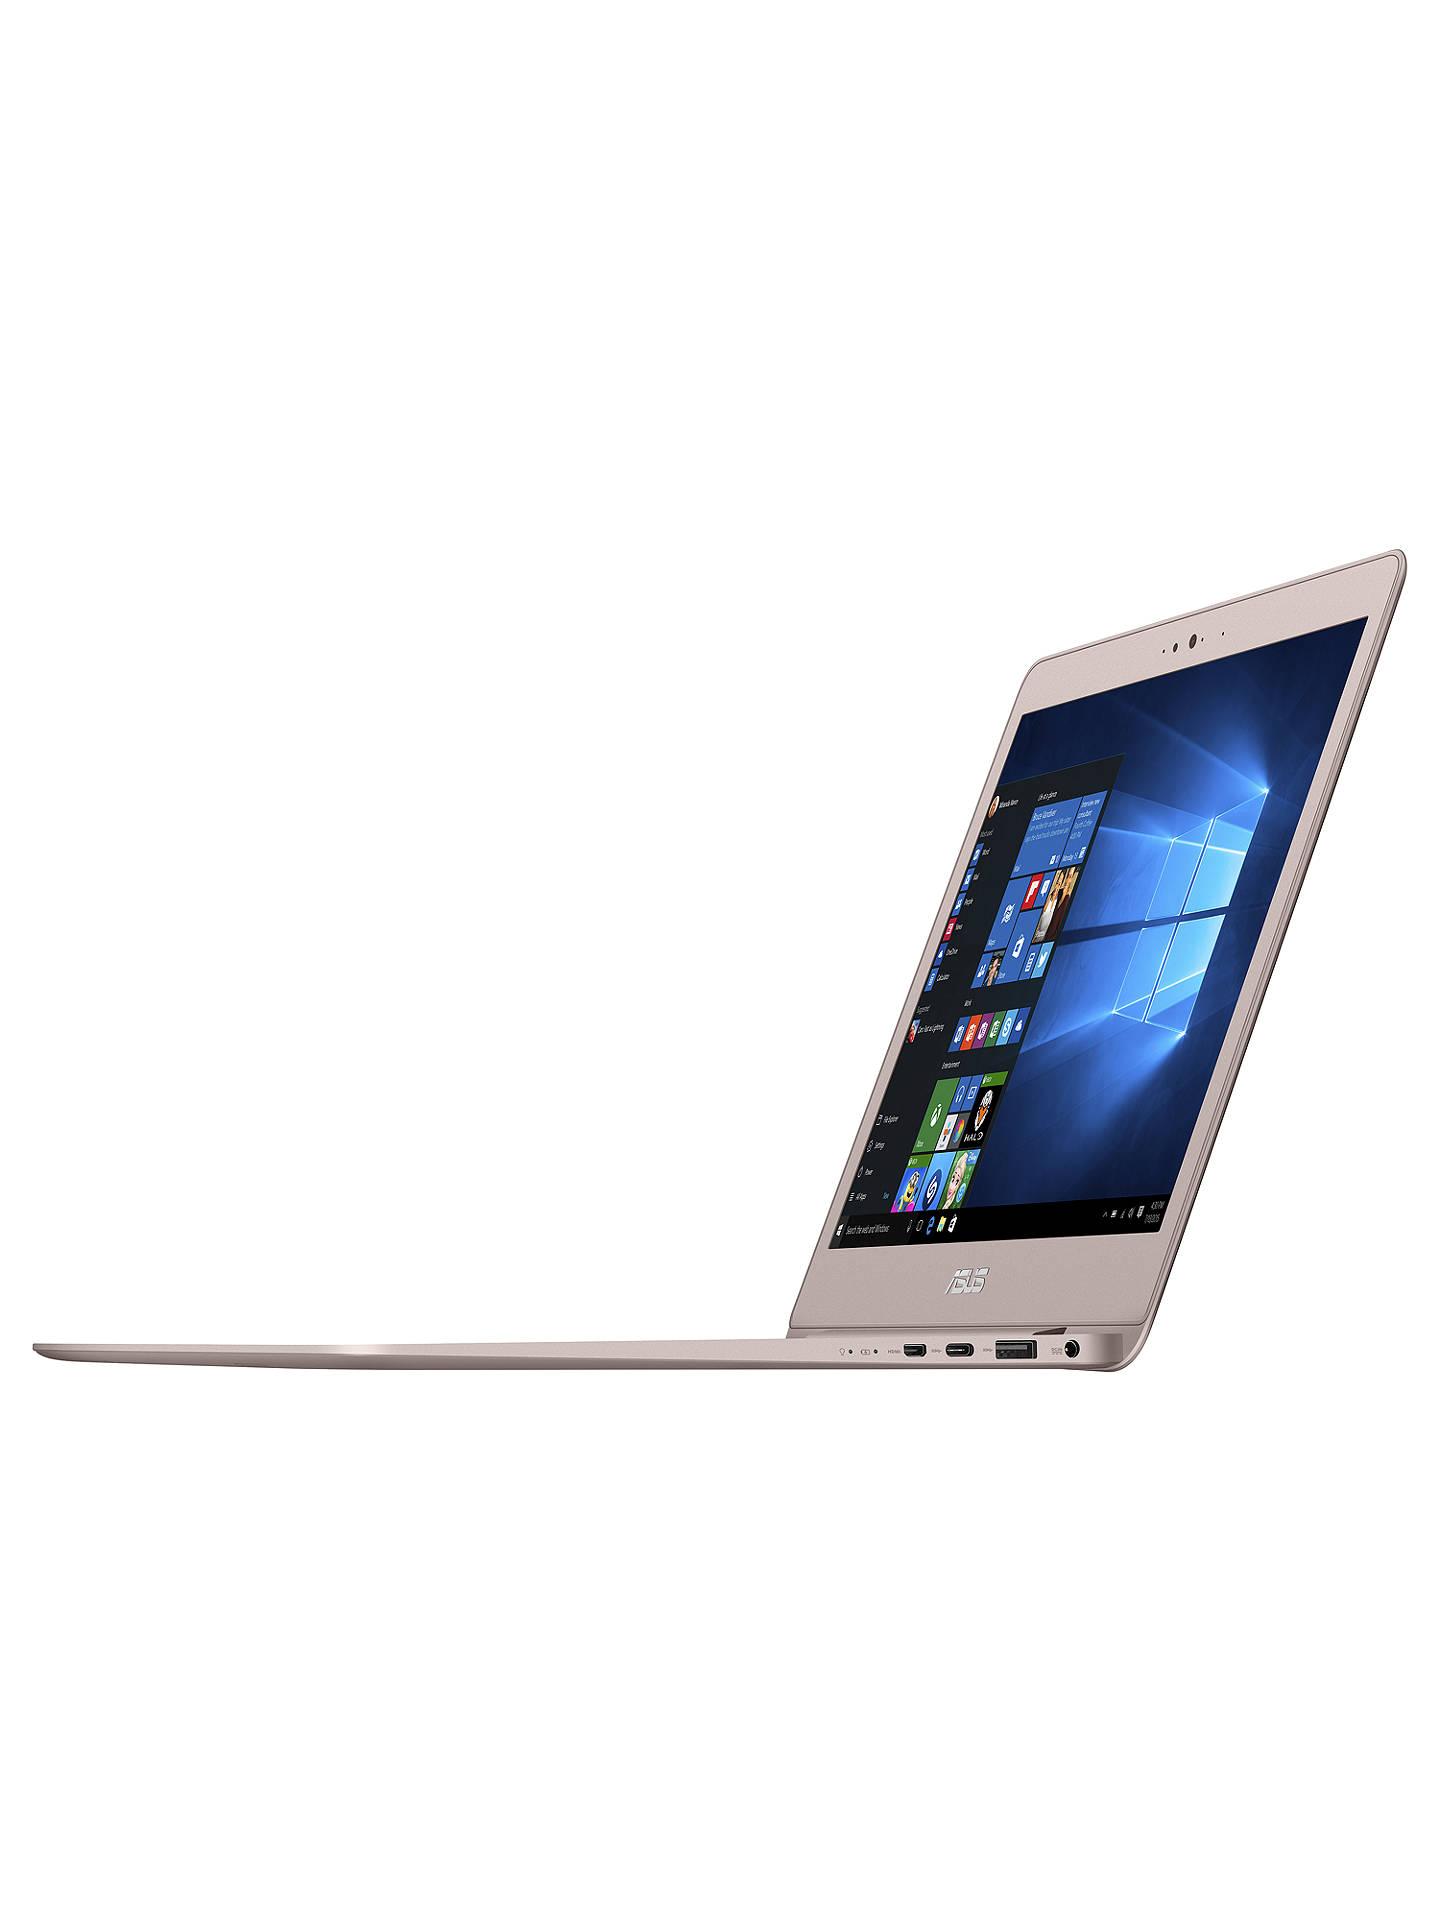 Asus Zenbook Ux330 Laptop Intel Core I5 8gb Ram 256gb Ssd 13 3